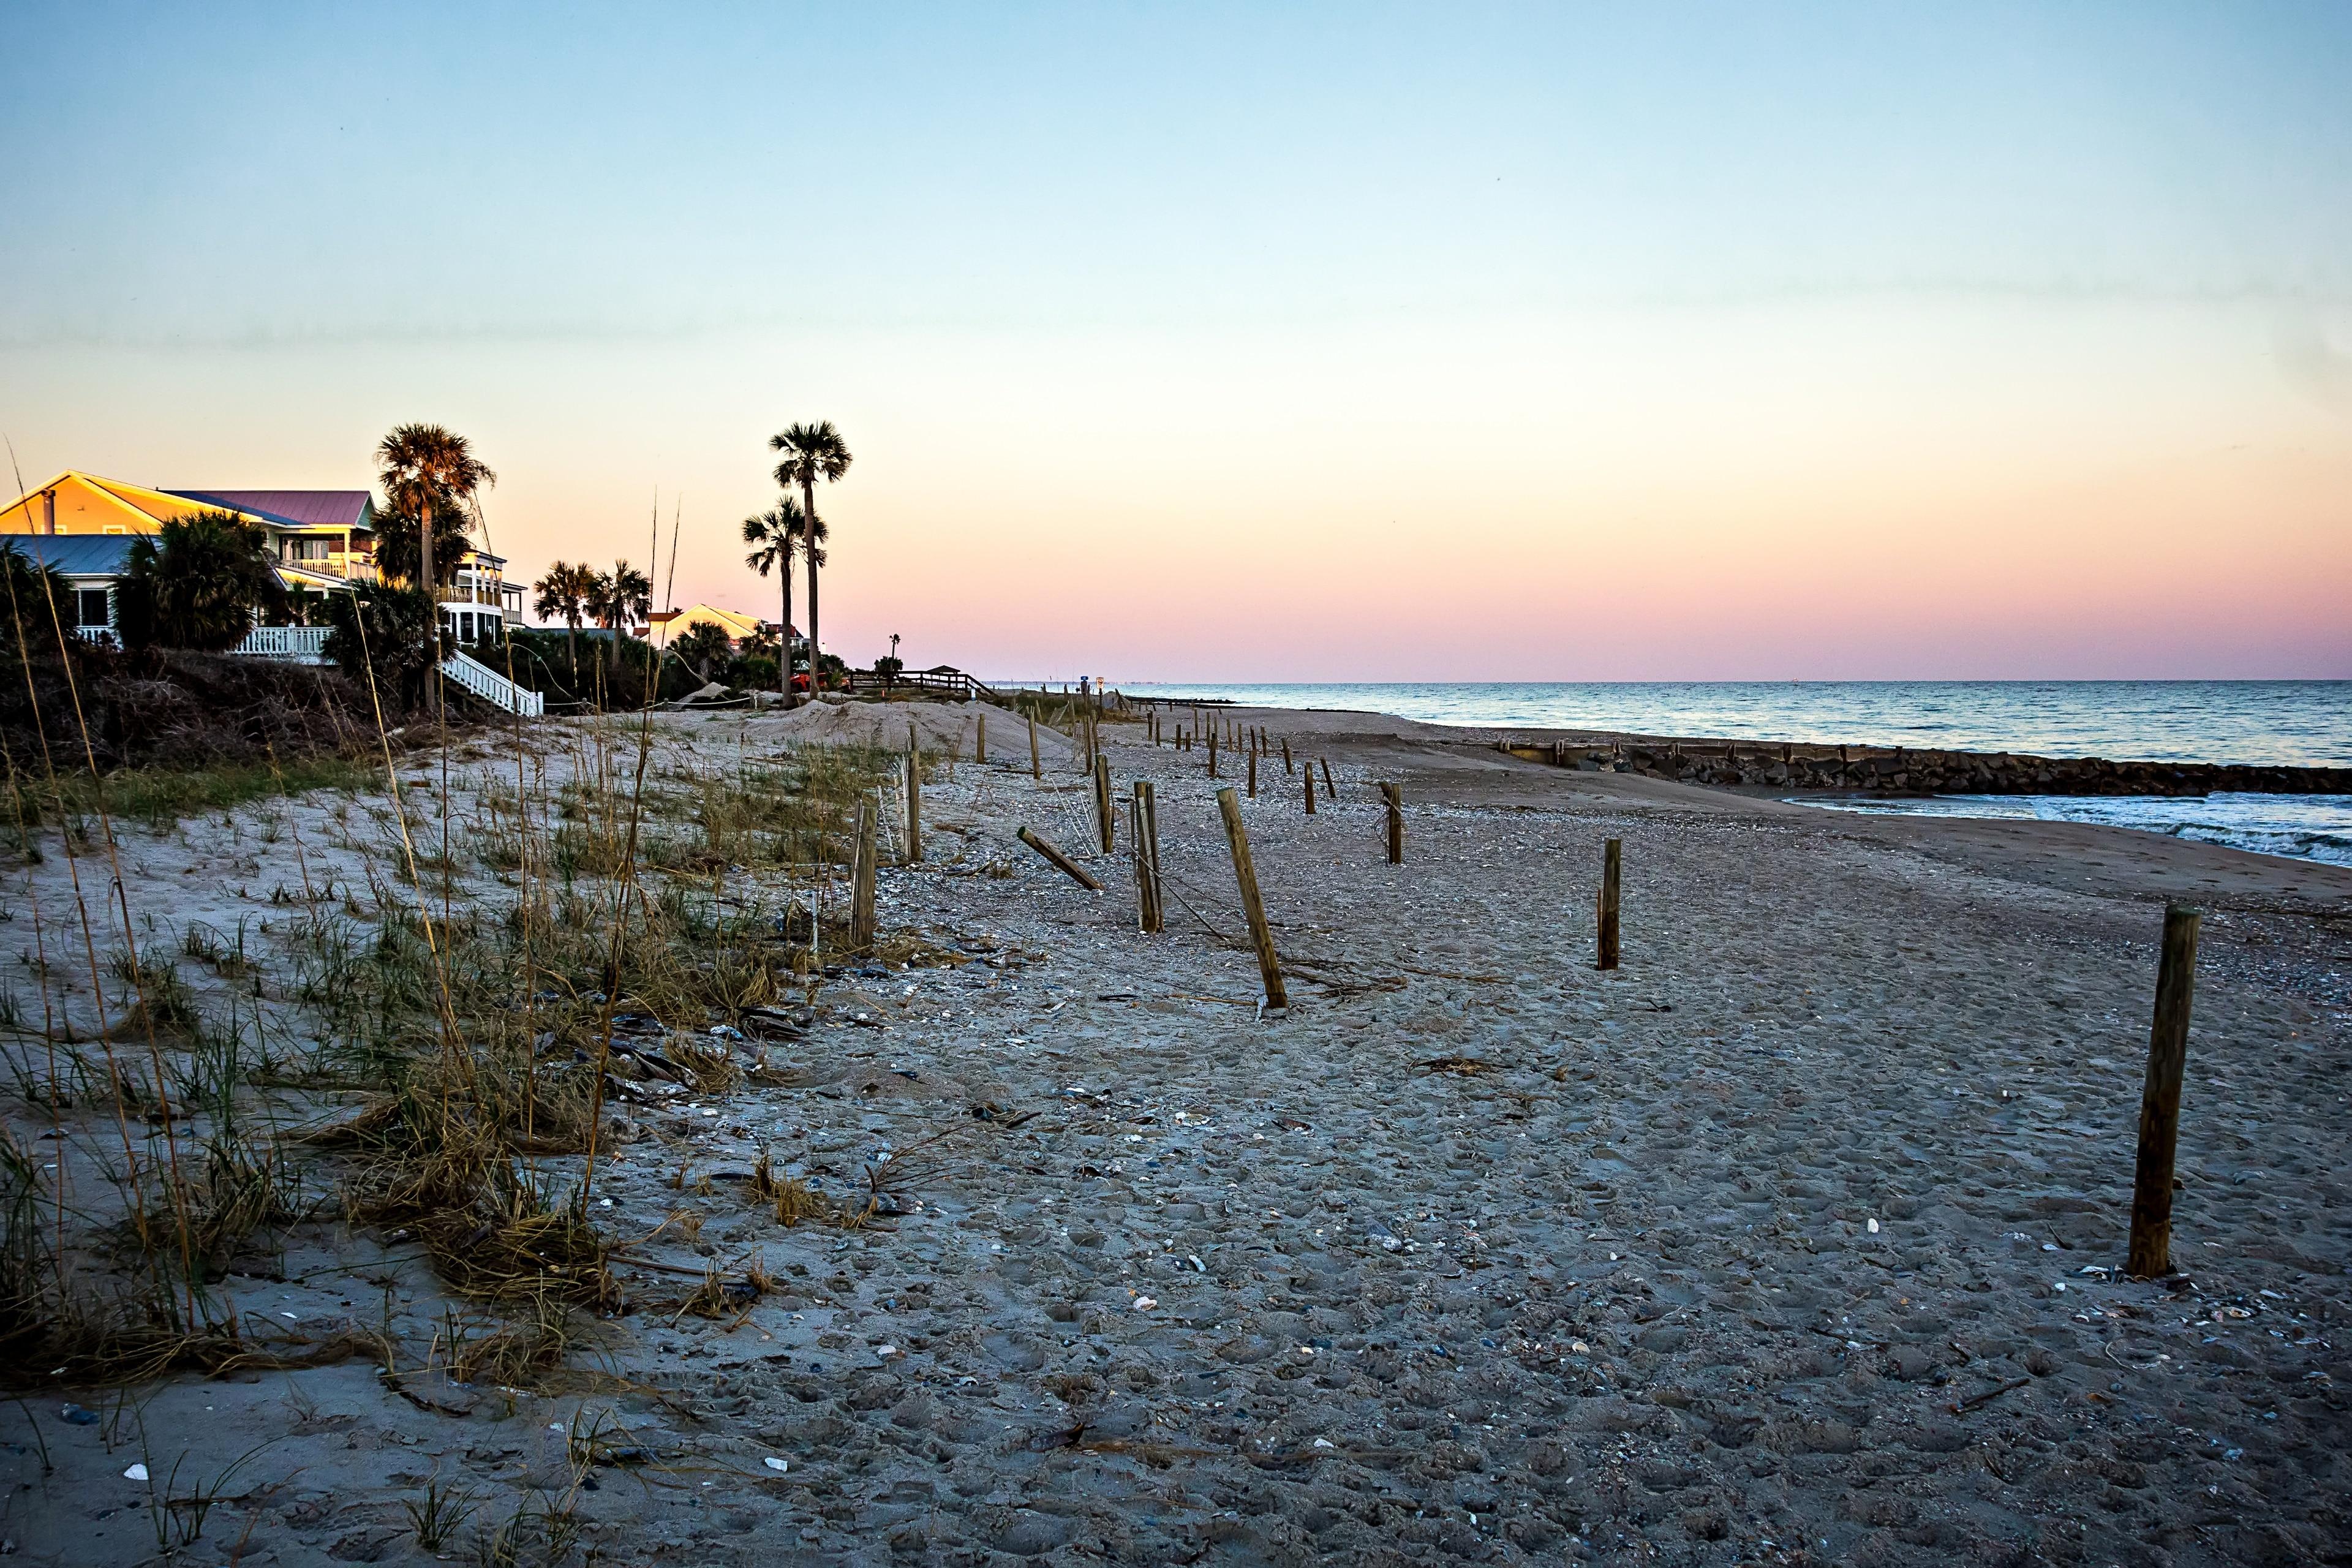 Edisto Beach, South Carolina, United States of America